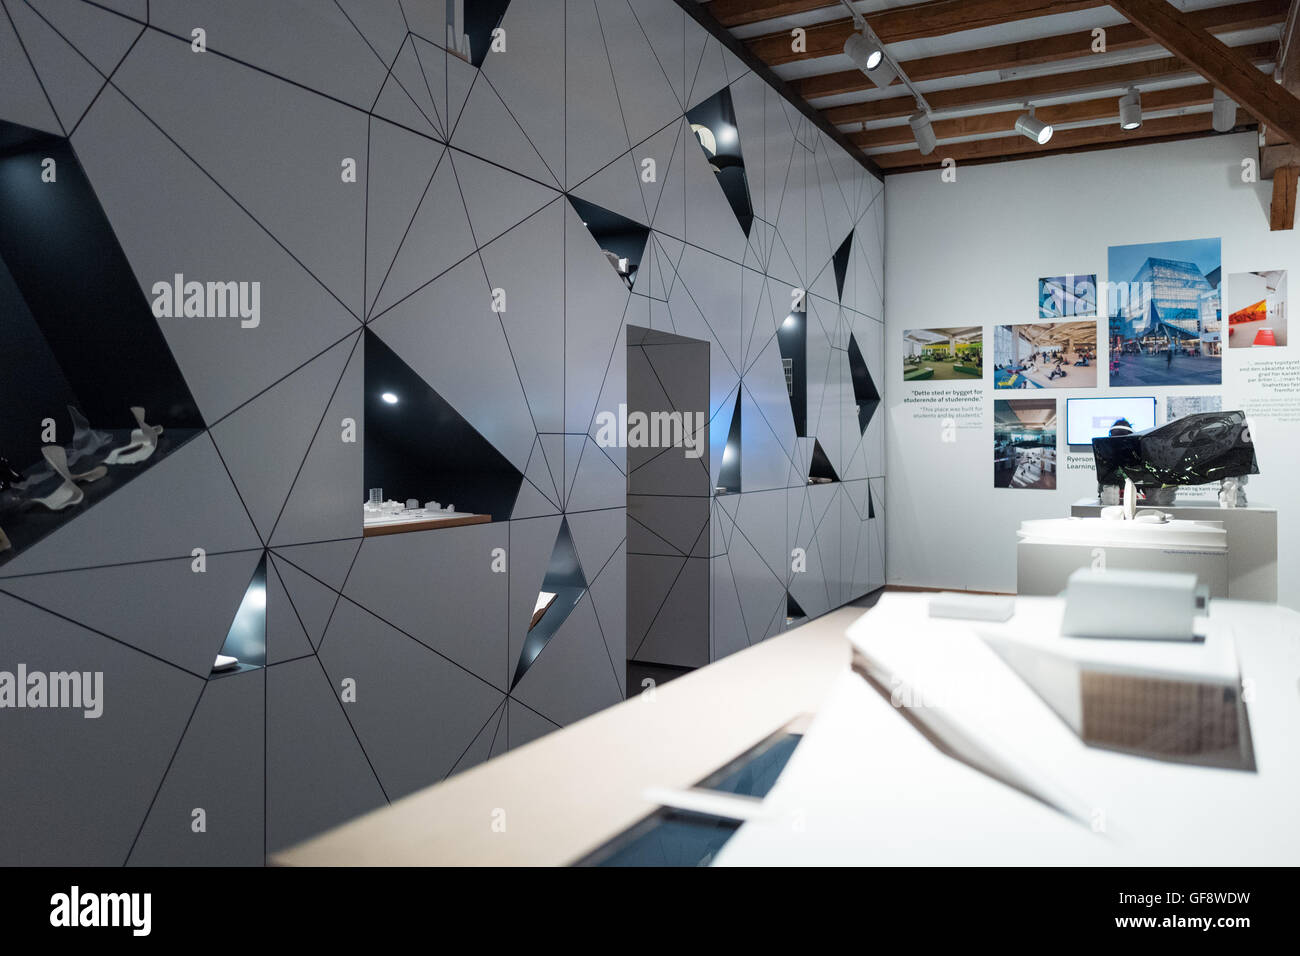 Copenhagen, Denmark - July 22, 2015: A hall of the Danish Architecture Centre - Stock Image